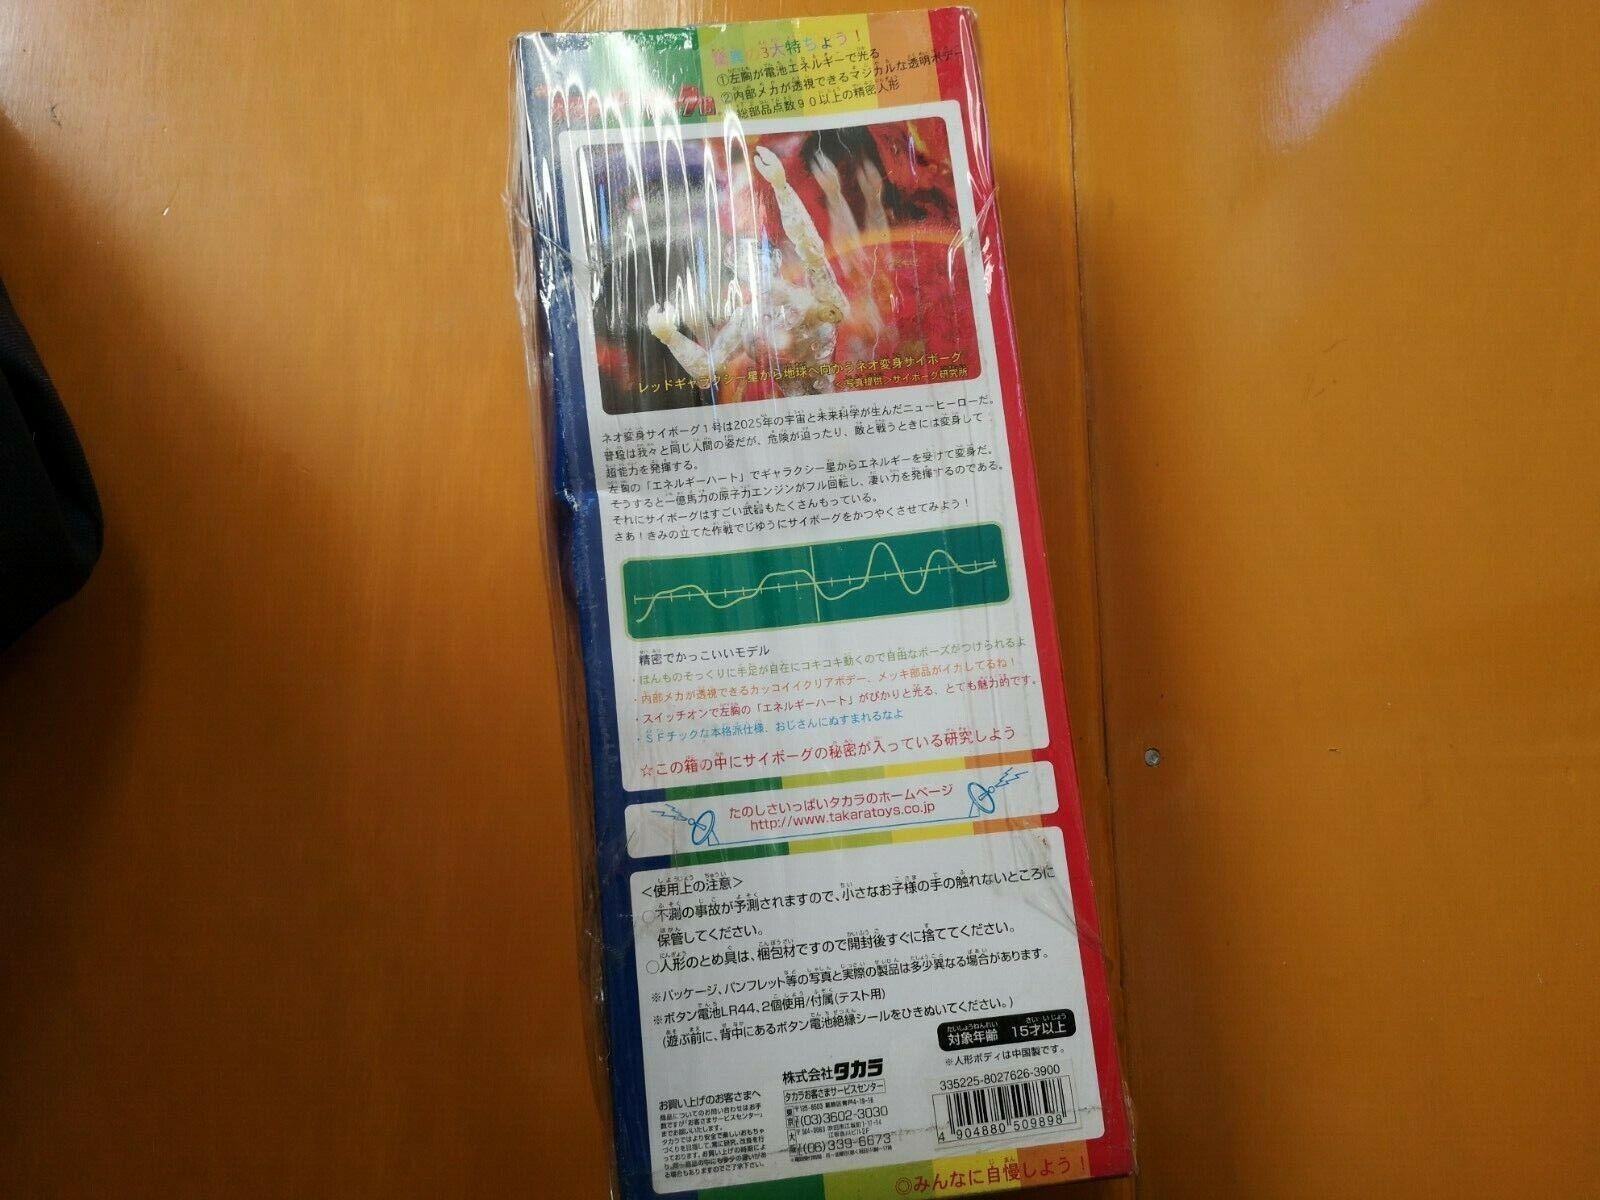 Neo Henshin Cyborg No. 1 gituttio b set TAKARA TAKARA TAKARA Alien shines japanese giocattolo F S 2ceddd